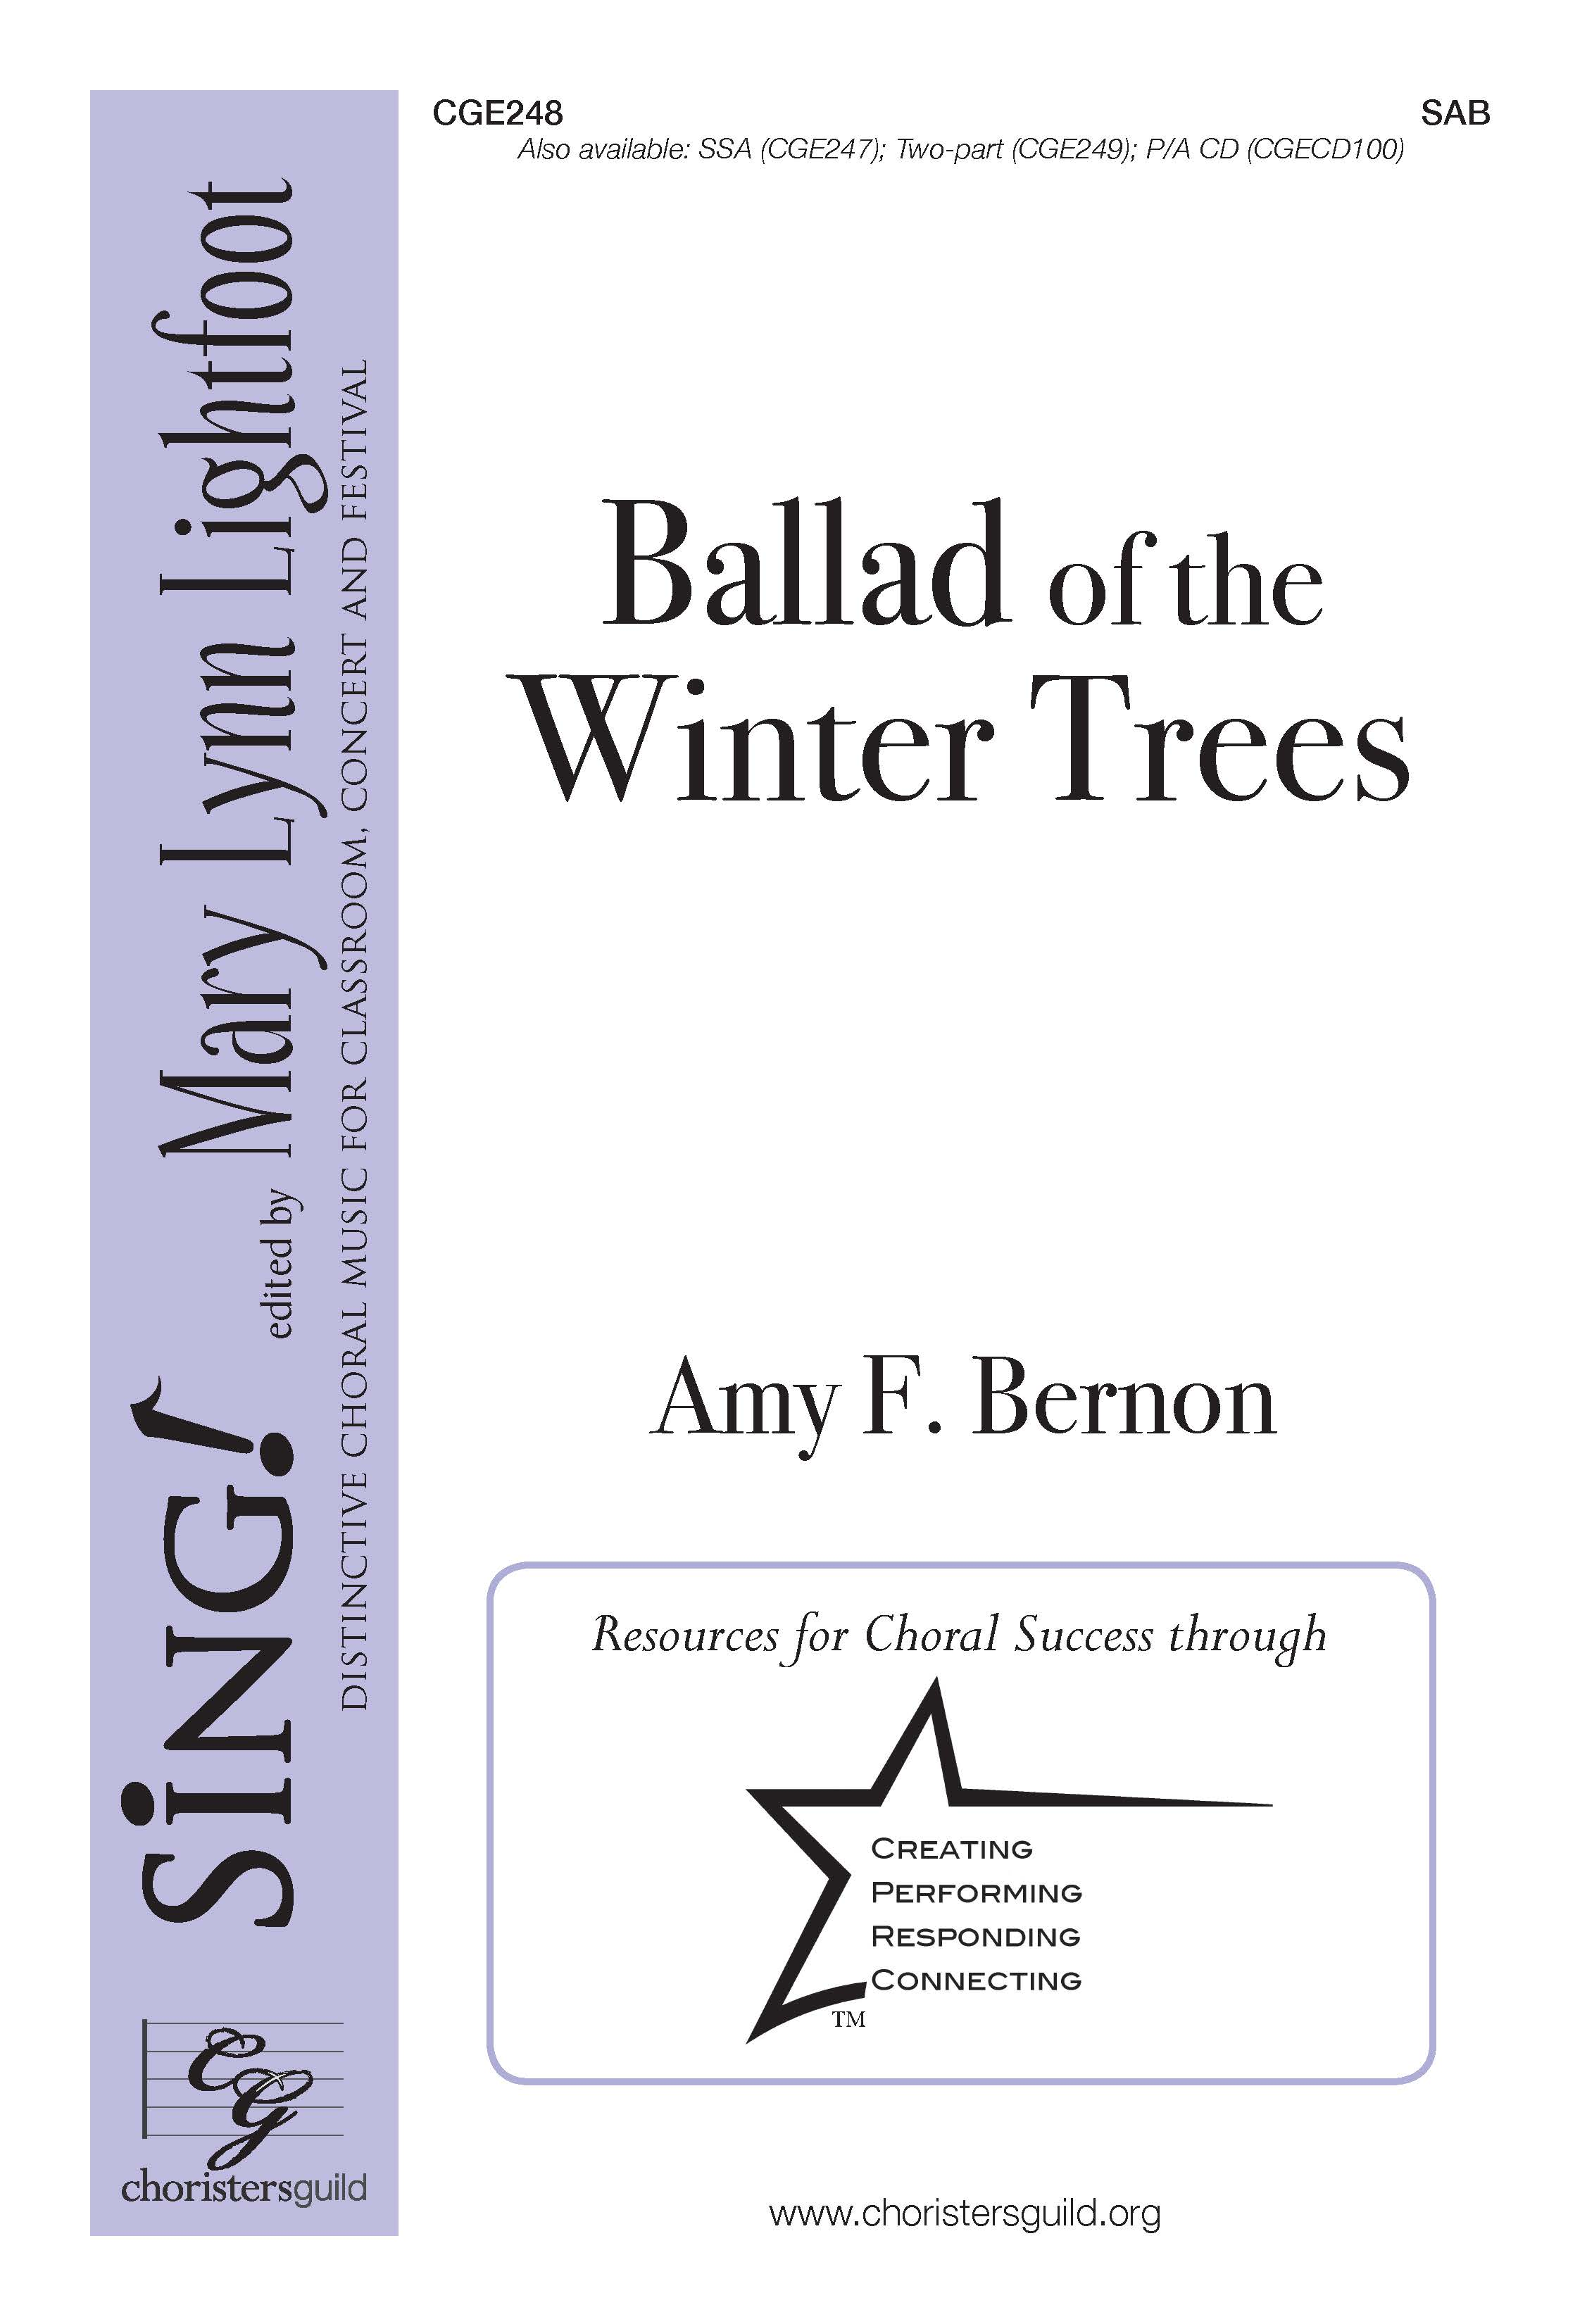 Ballad of the Winter Trees SAB